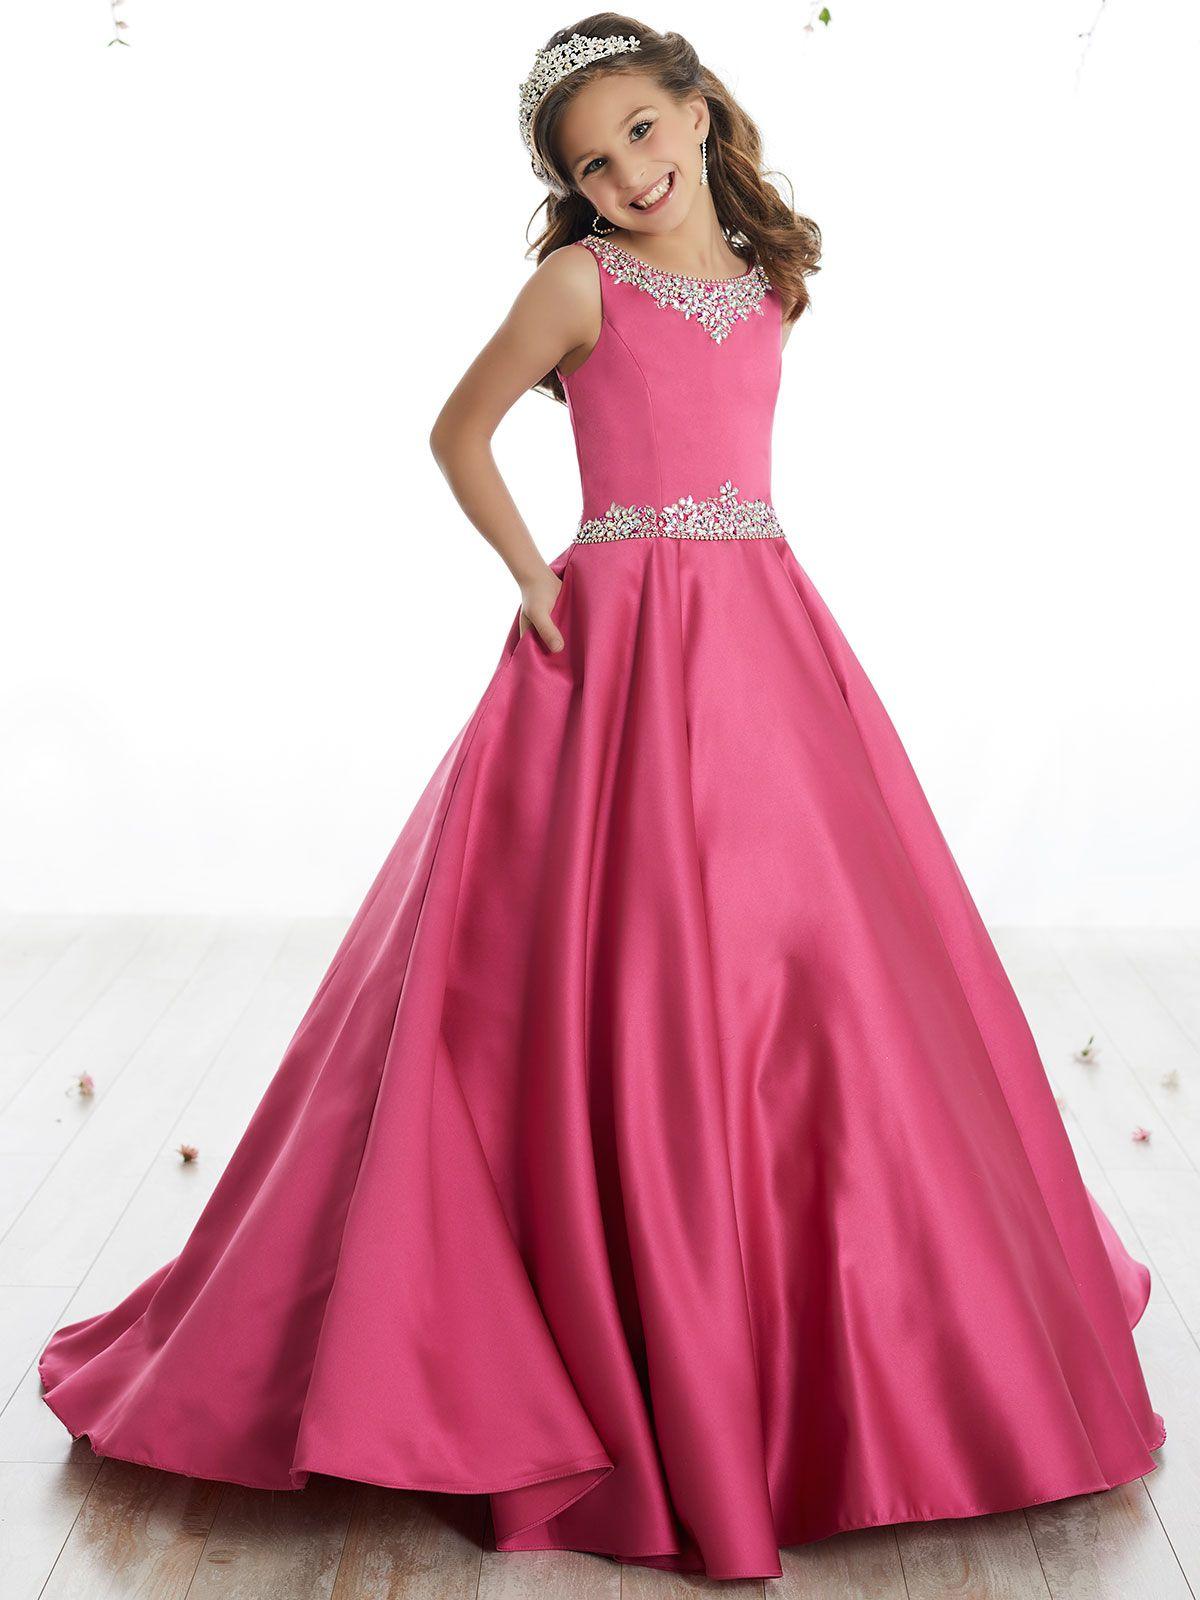 Tiffany Princes 13506 Scoop Neckline Pageant Dress | pageant dresses ...